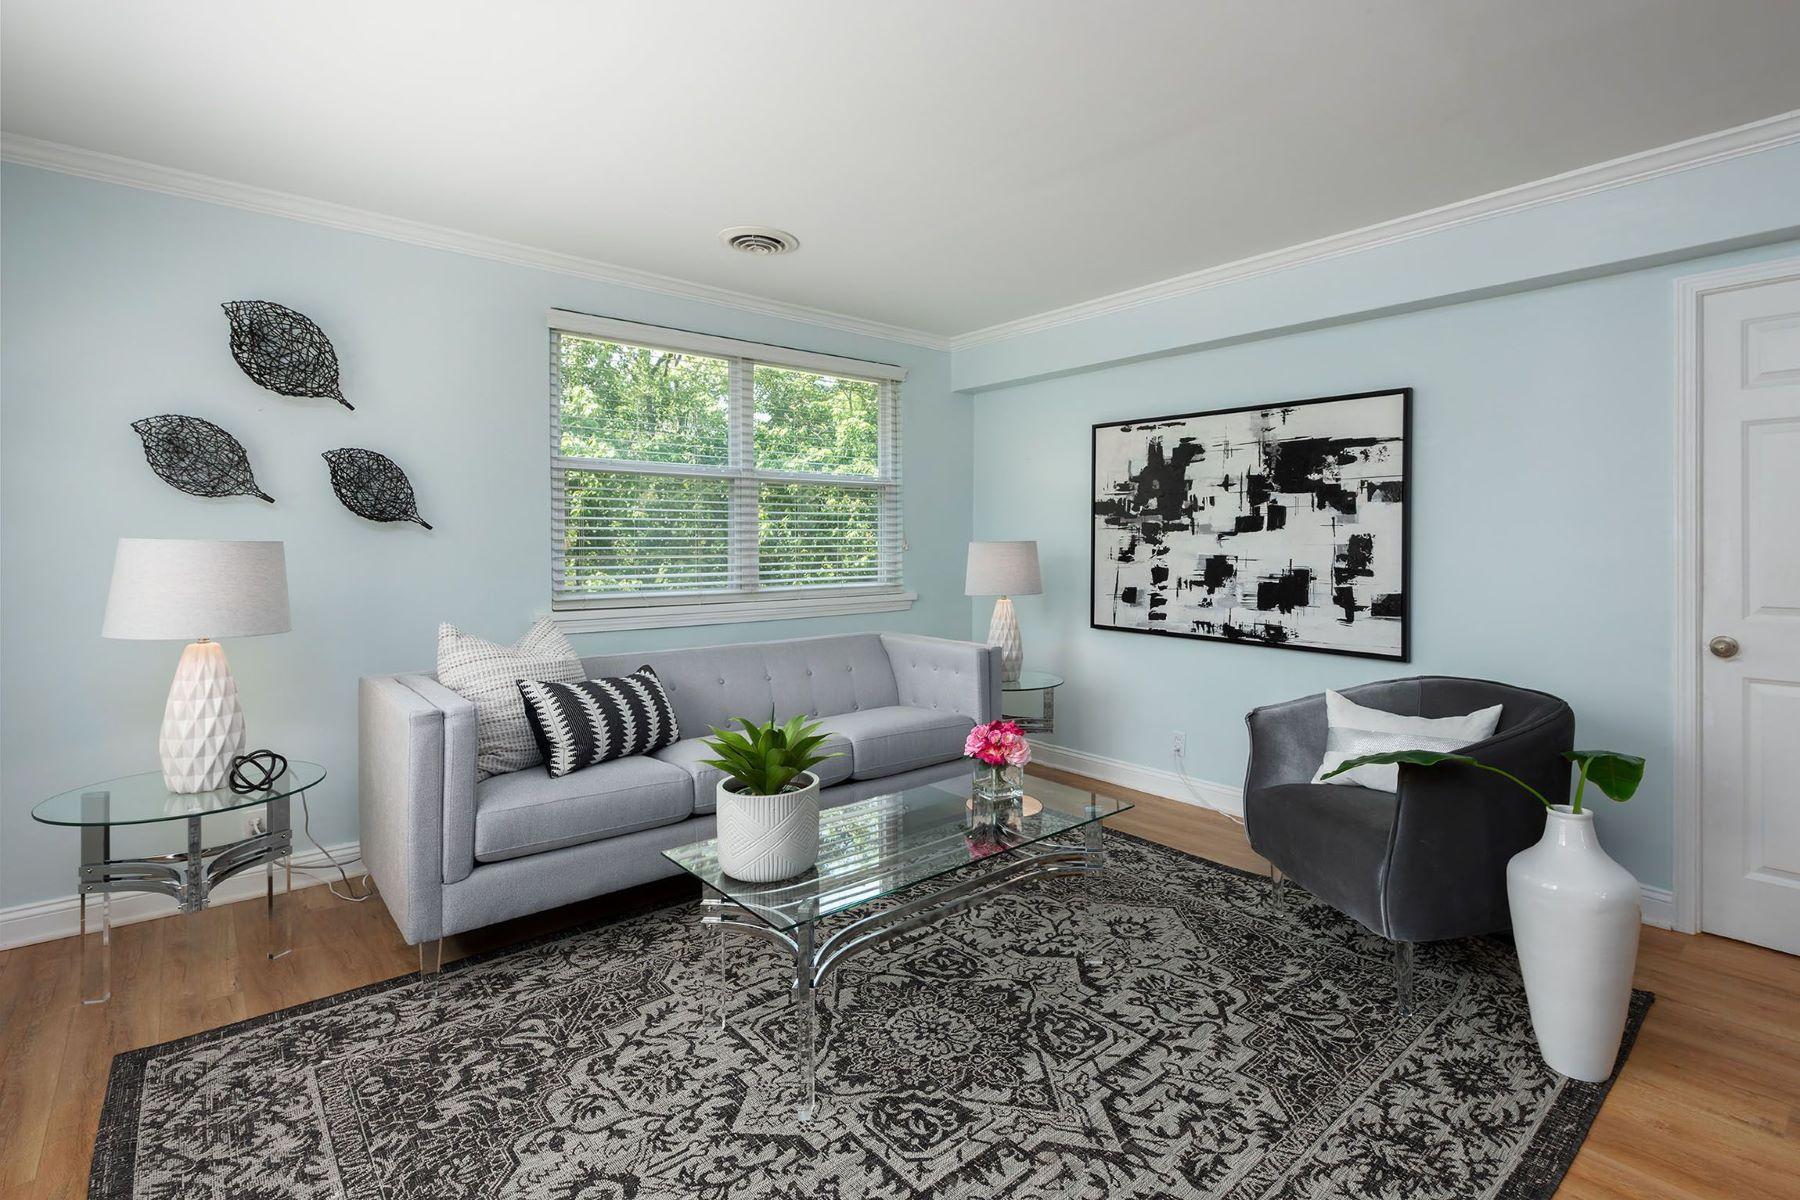 Condominium for Sale at Renovated Moorlands Condo 7571 Buckingham Drive Unit 5 Clayton, Missouri 63105 United States